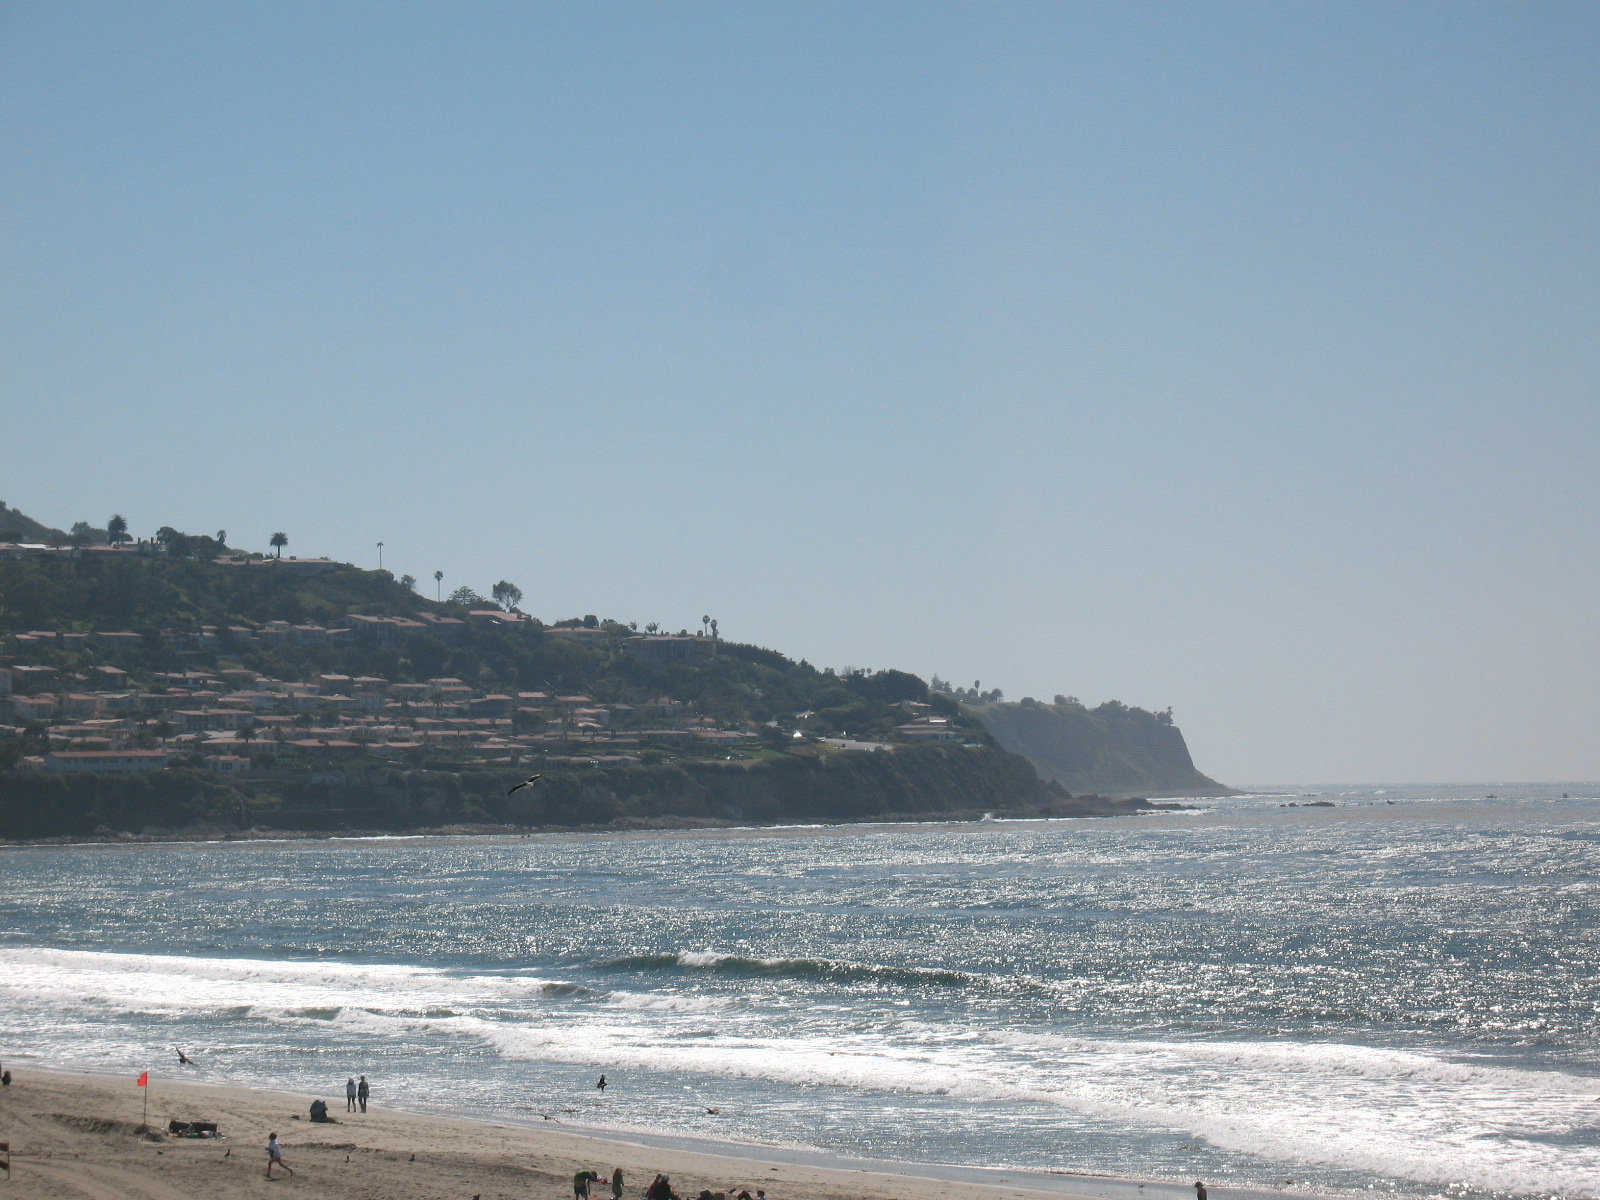 Palos Verdes from Torrance Beach